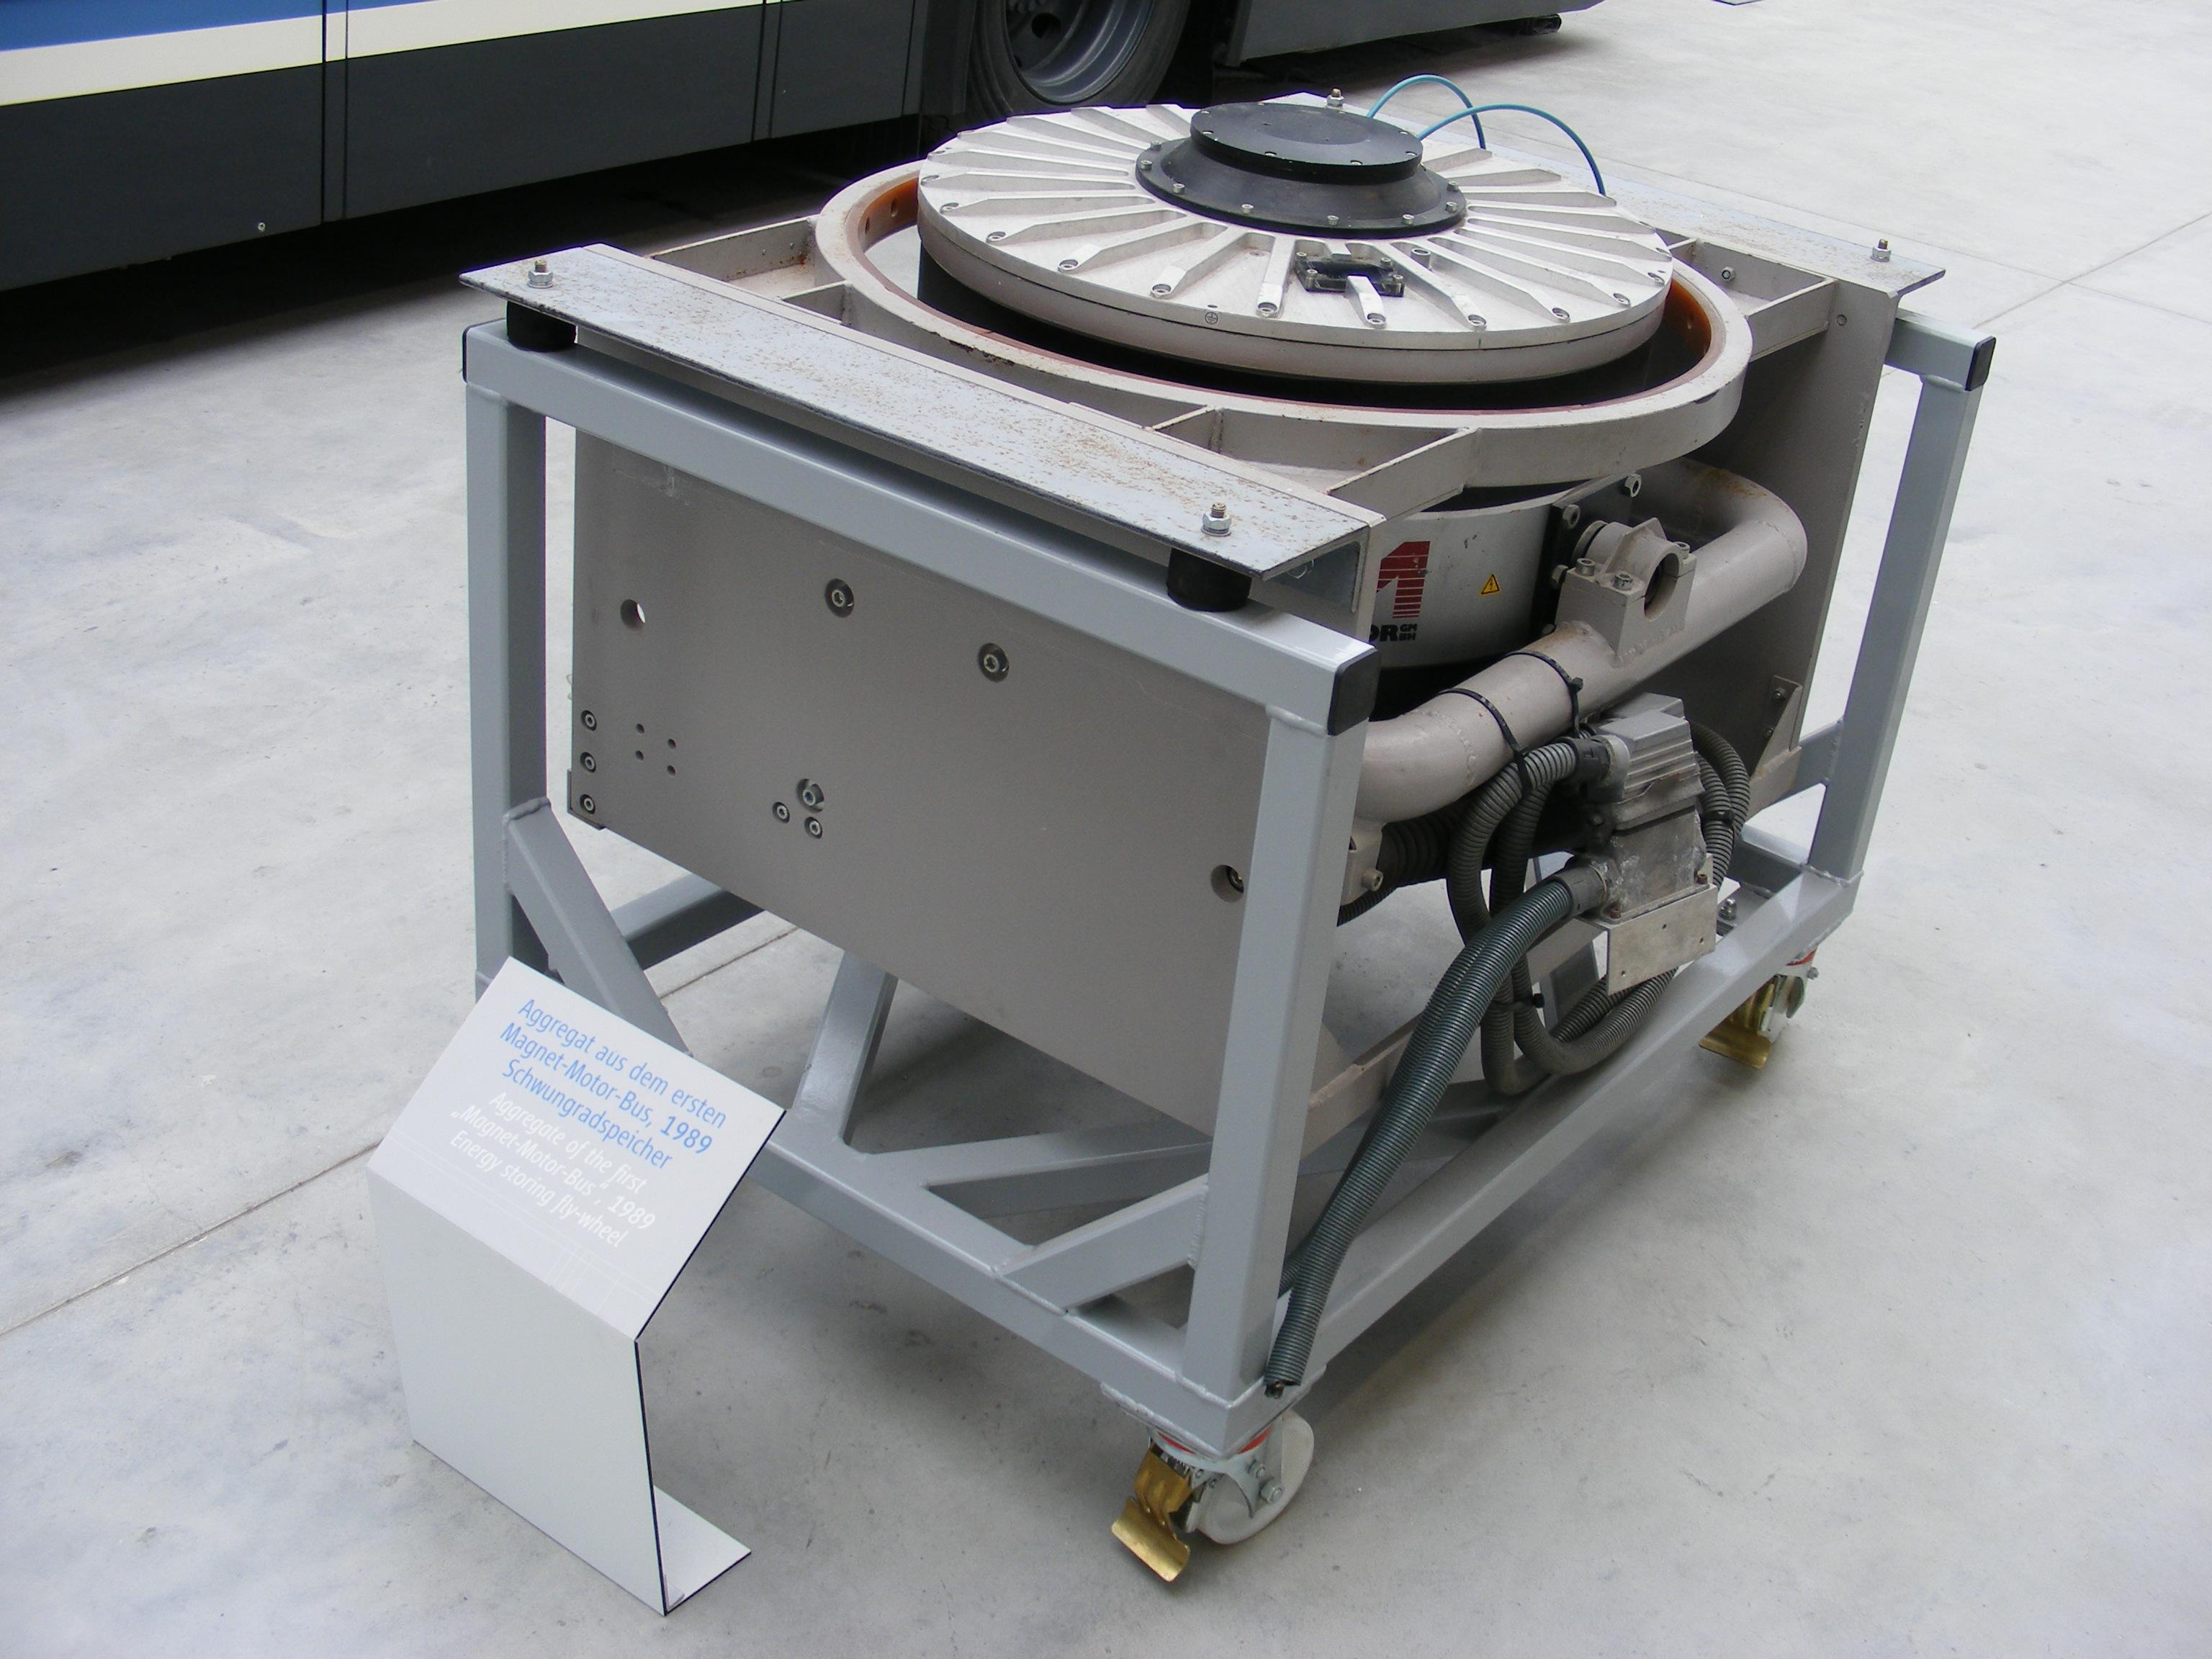 File:Schwungradspeicher (Magnet Motor), Bj. 1989 - Exponat